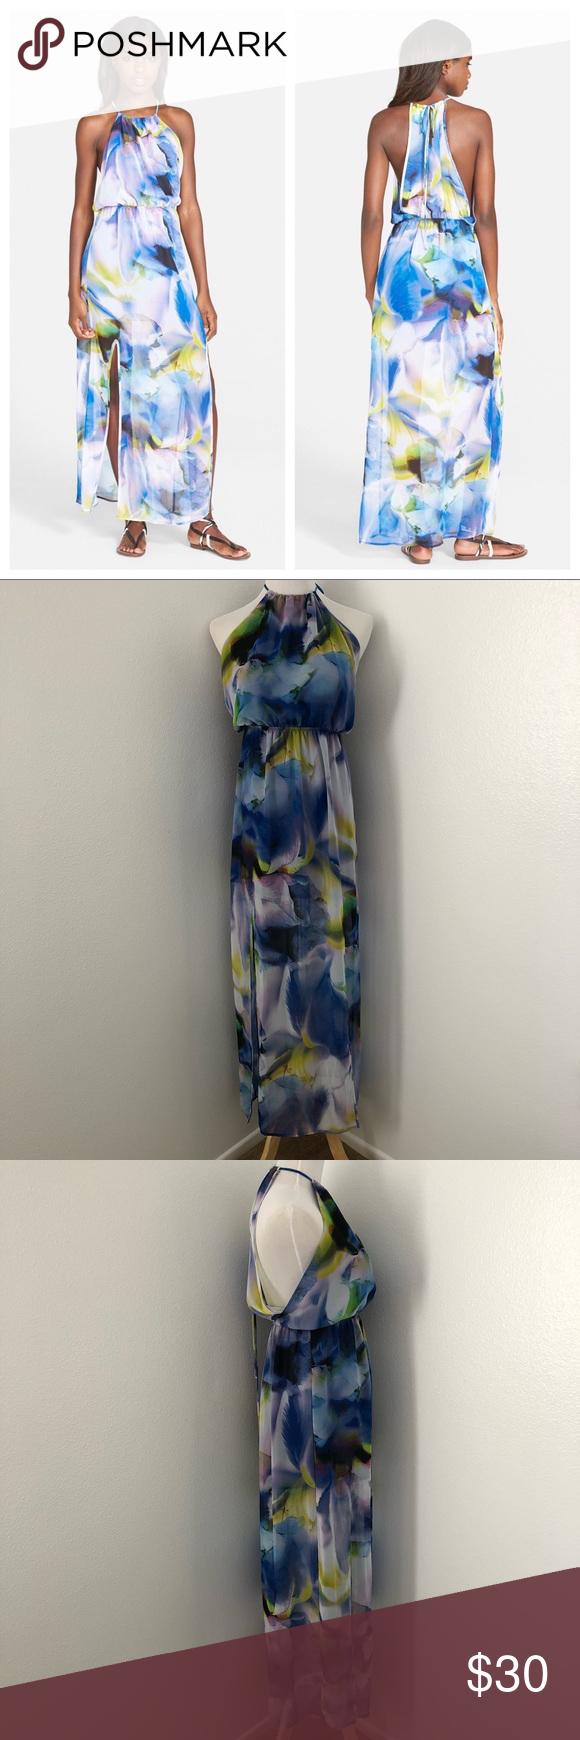 Nordstrom Leith Watercolor Maxi Dress M Clothes Design Leith Dress Fashion [ 1740 x 580 Pixel ]